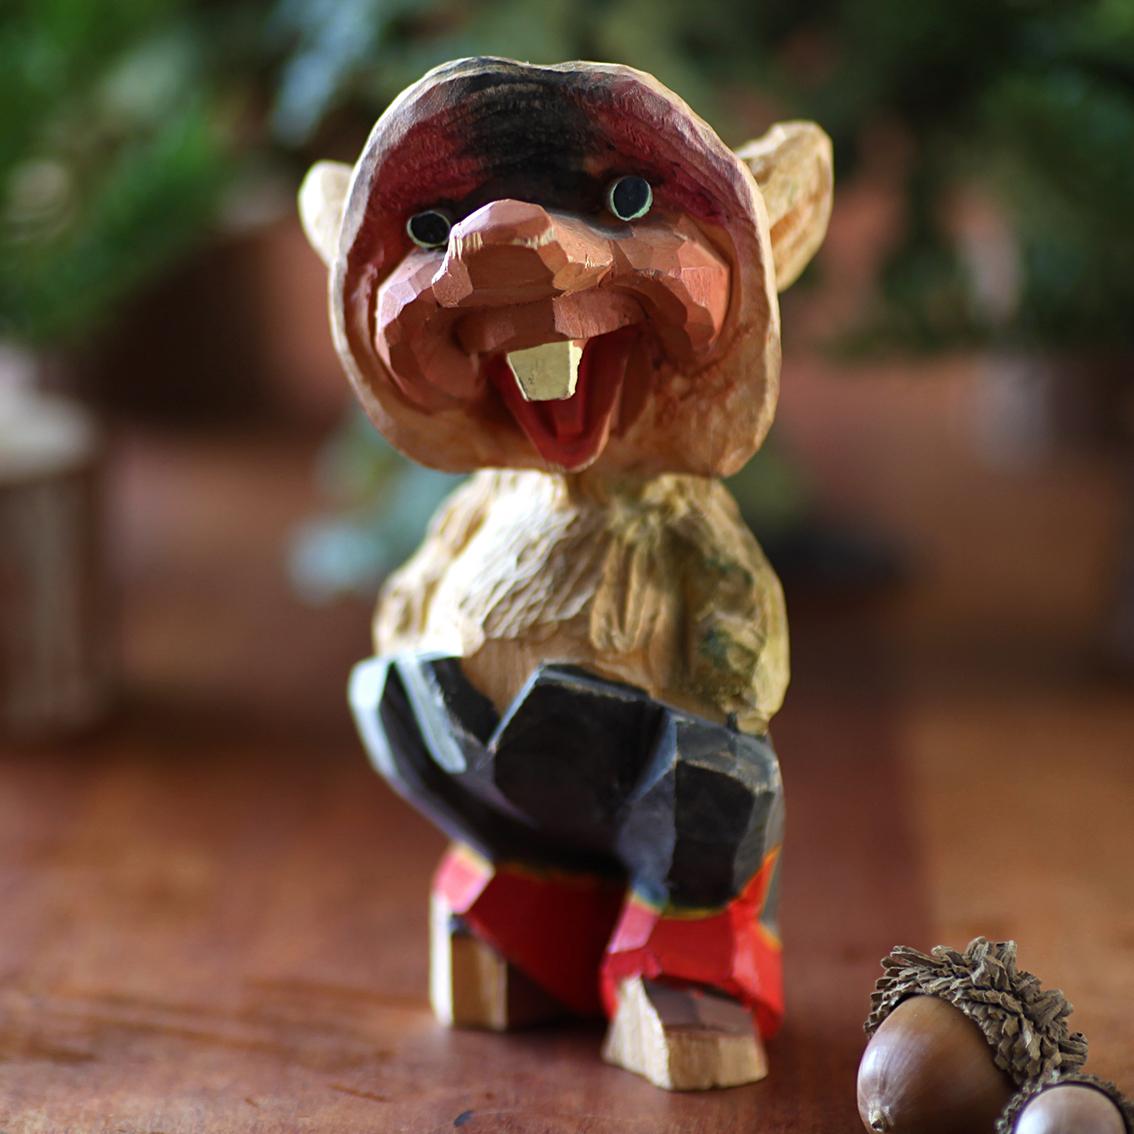 Henning ヘニング Troll トロール 木彫り人形-2 北欧ヴィンテージ